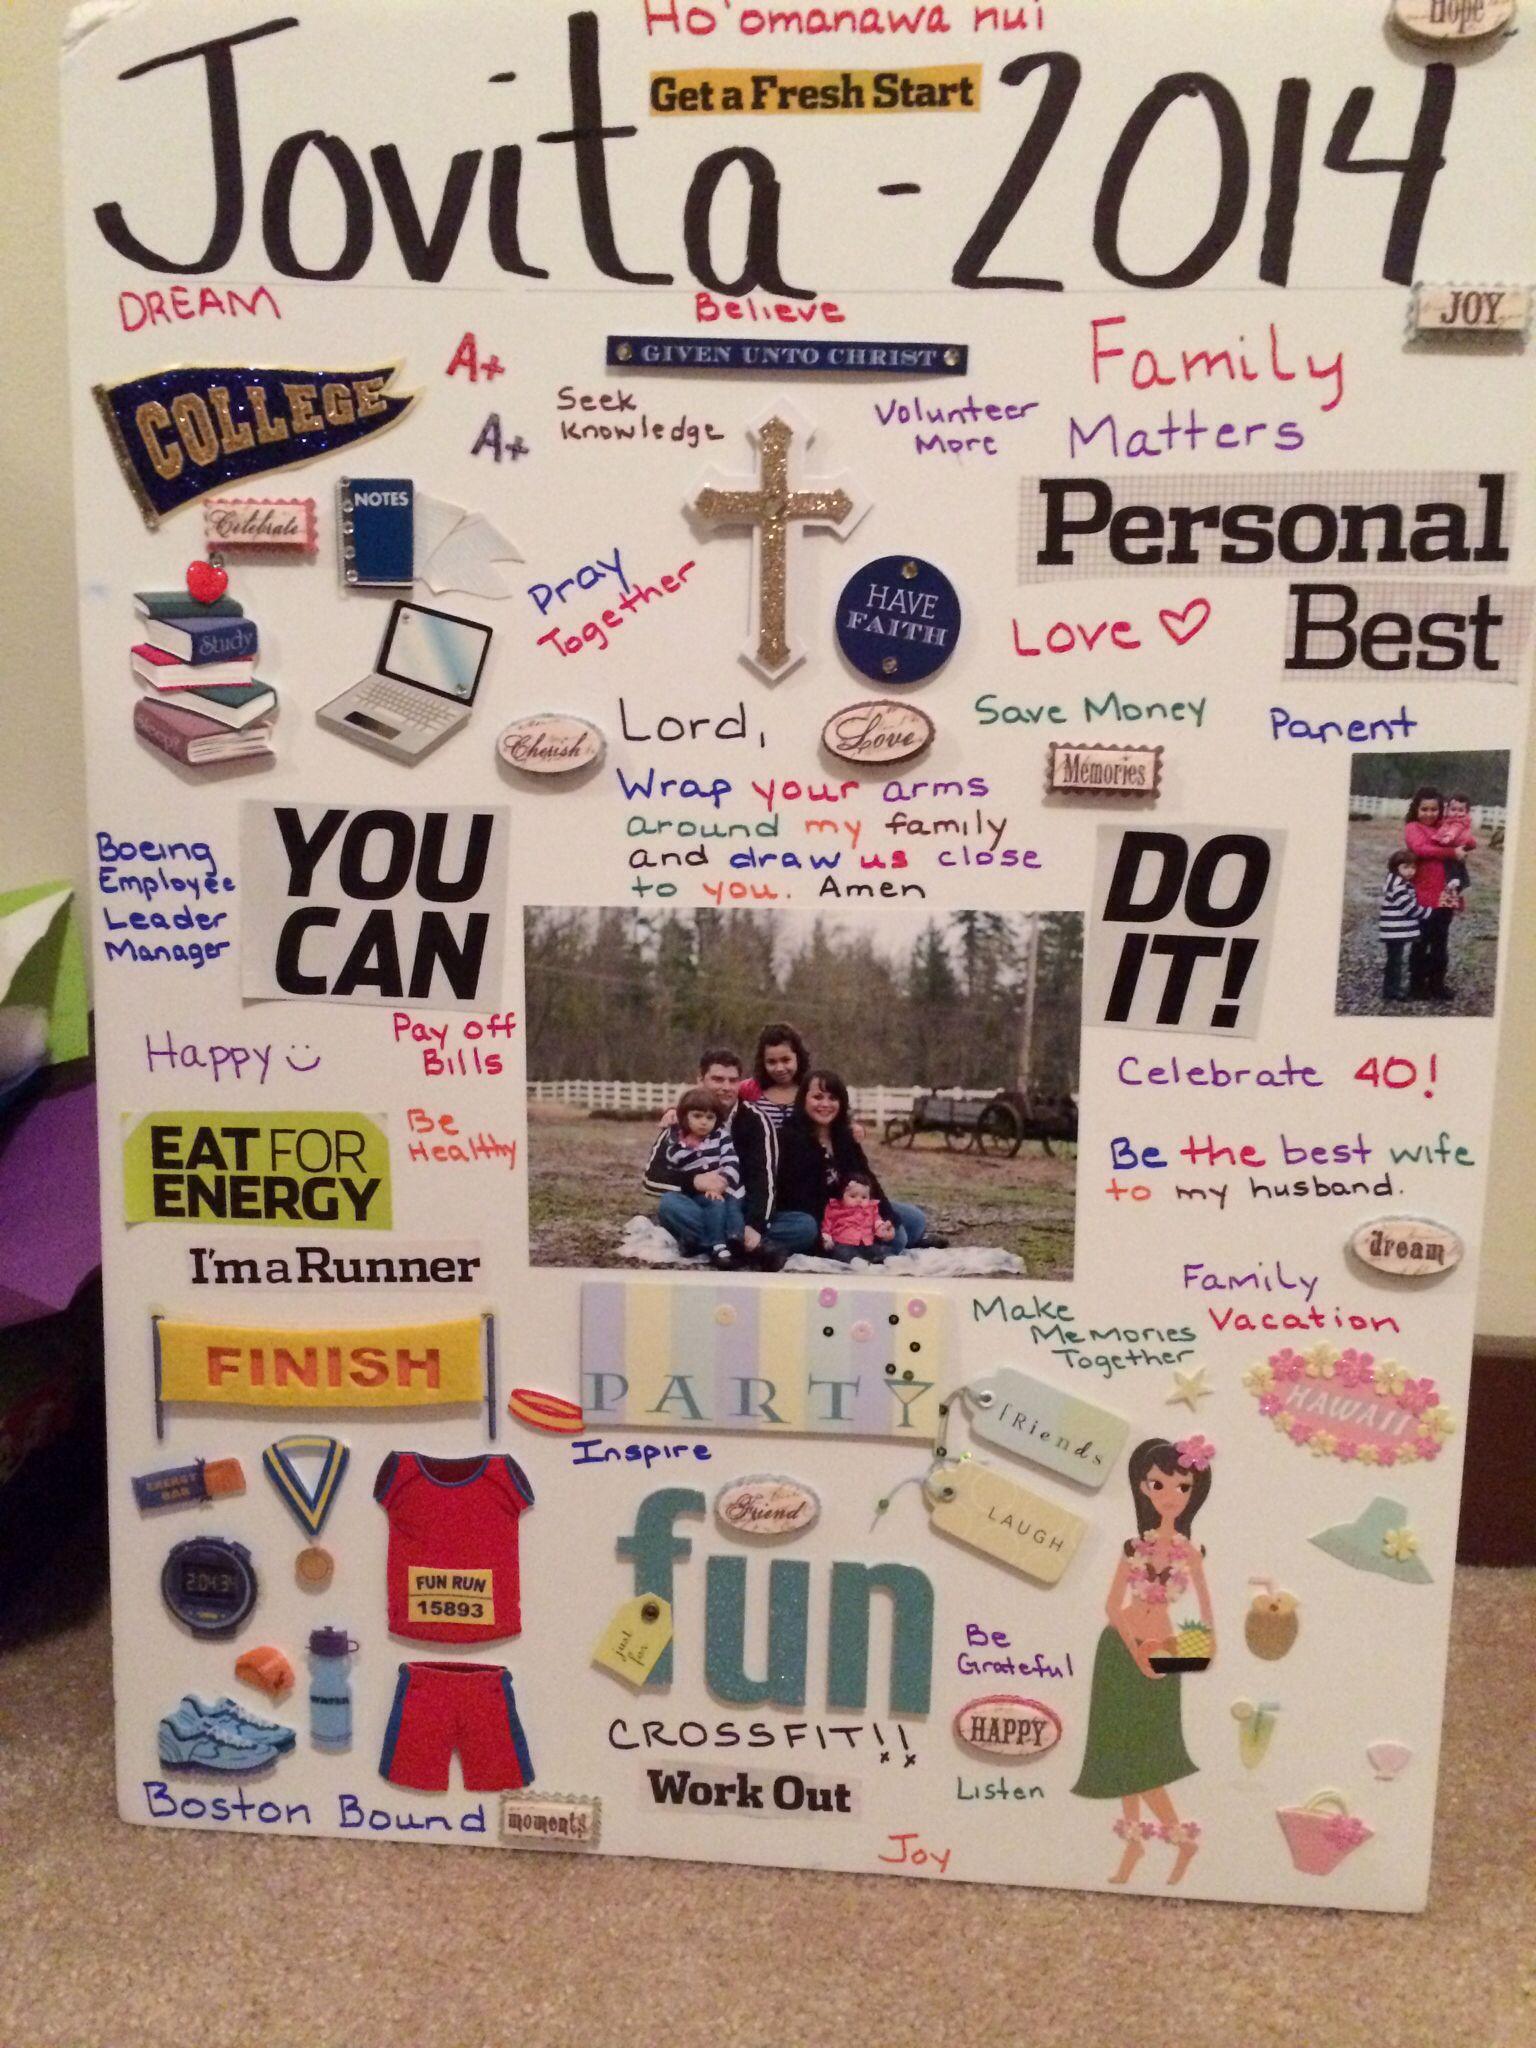 Jovita 2014 Vision Board Good Ideas Pinterest Board